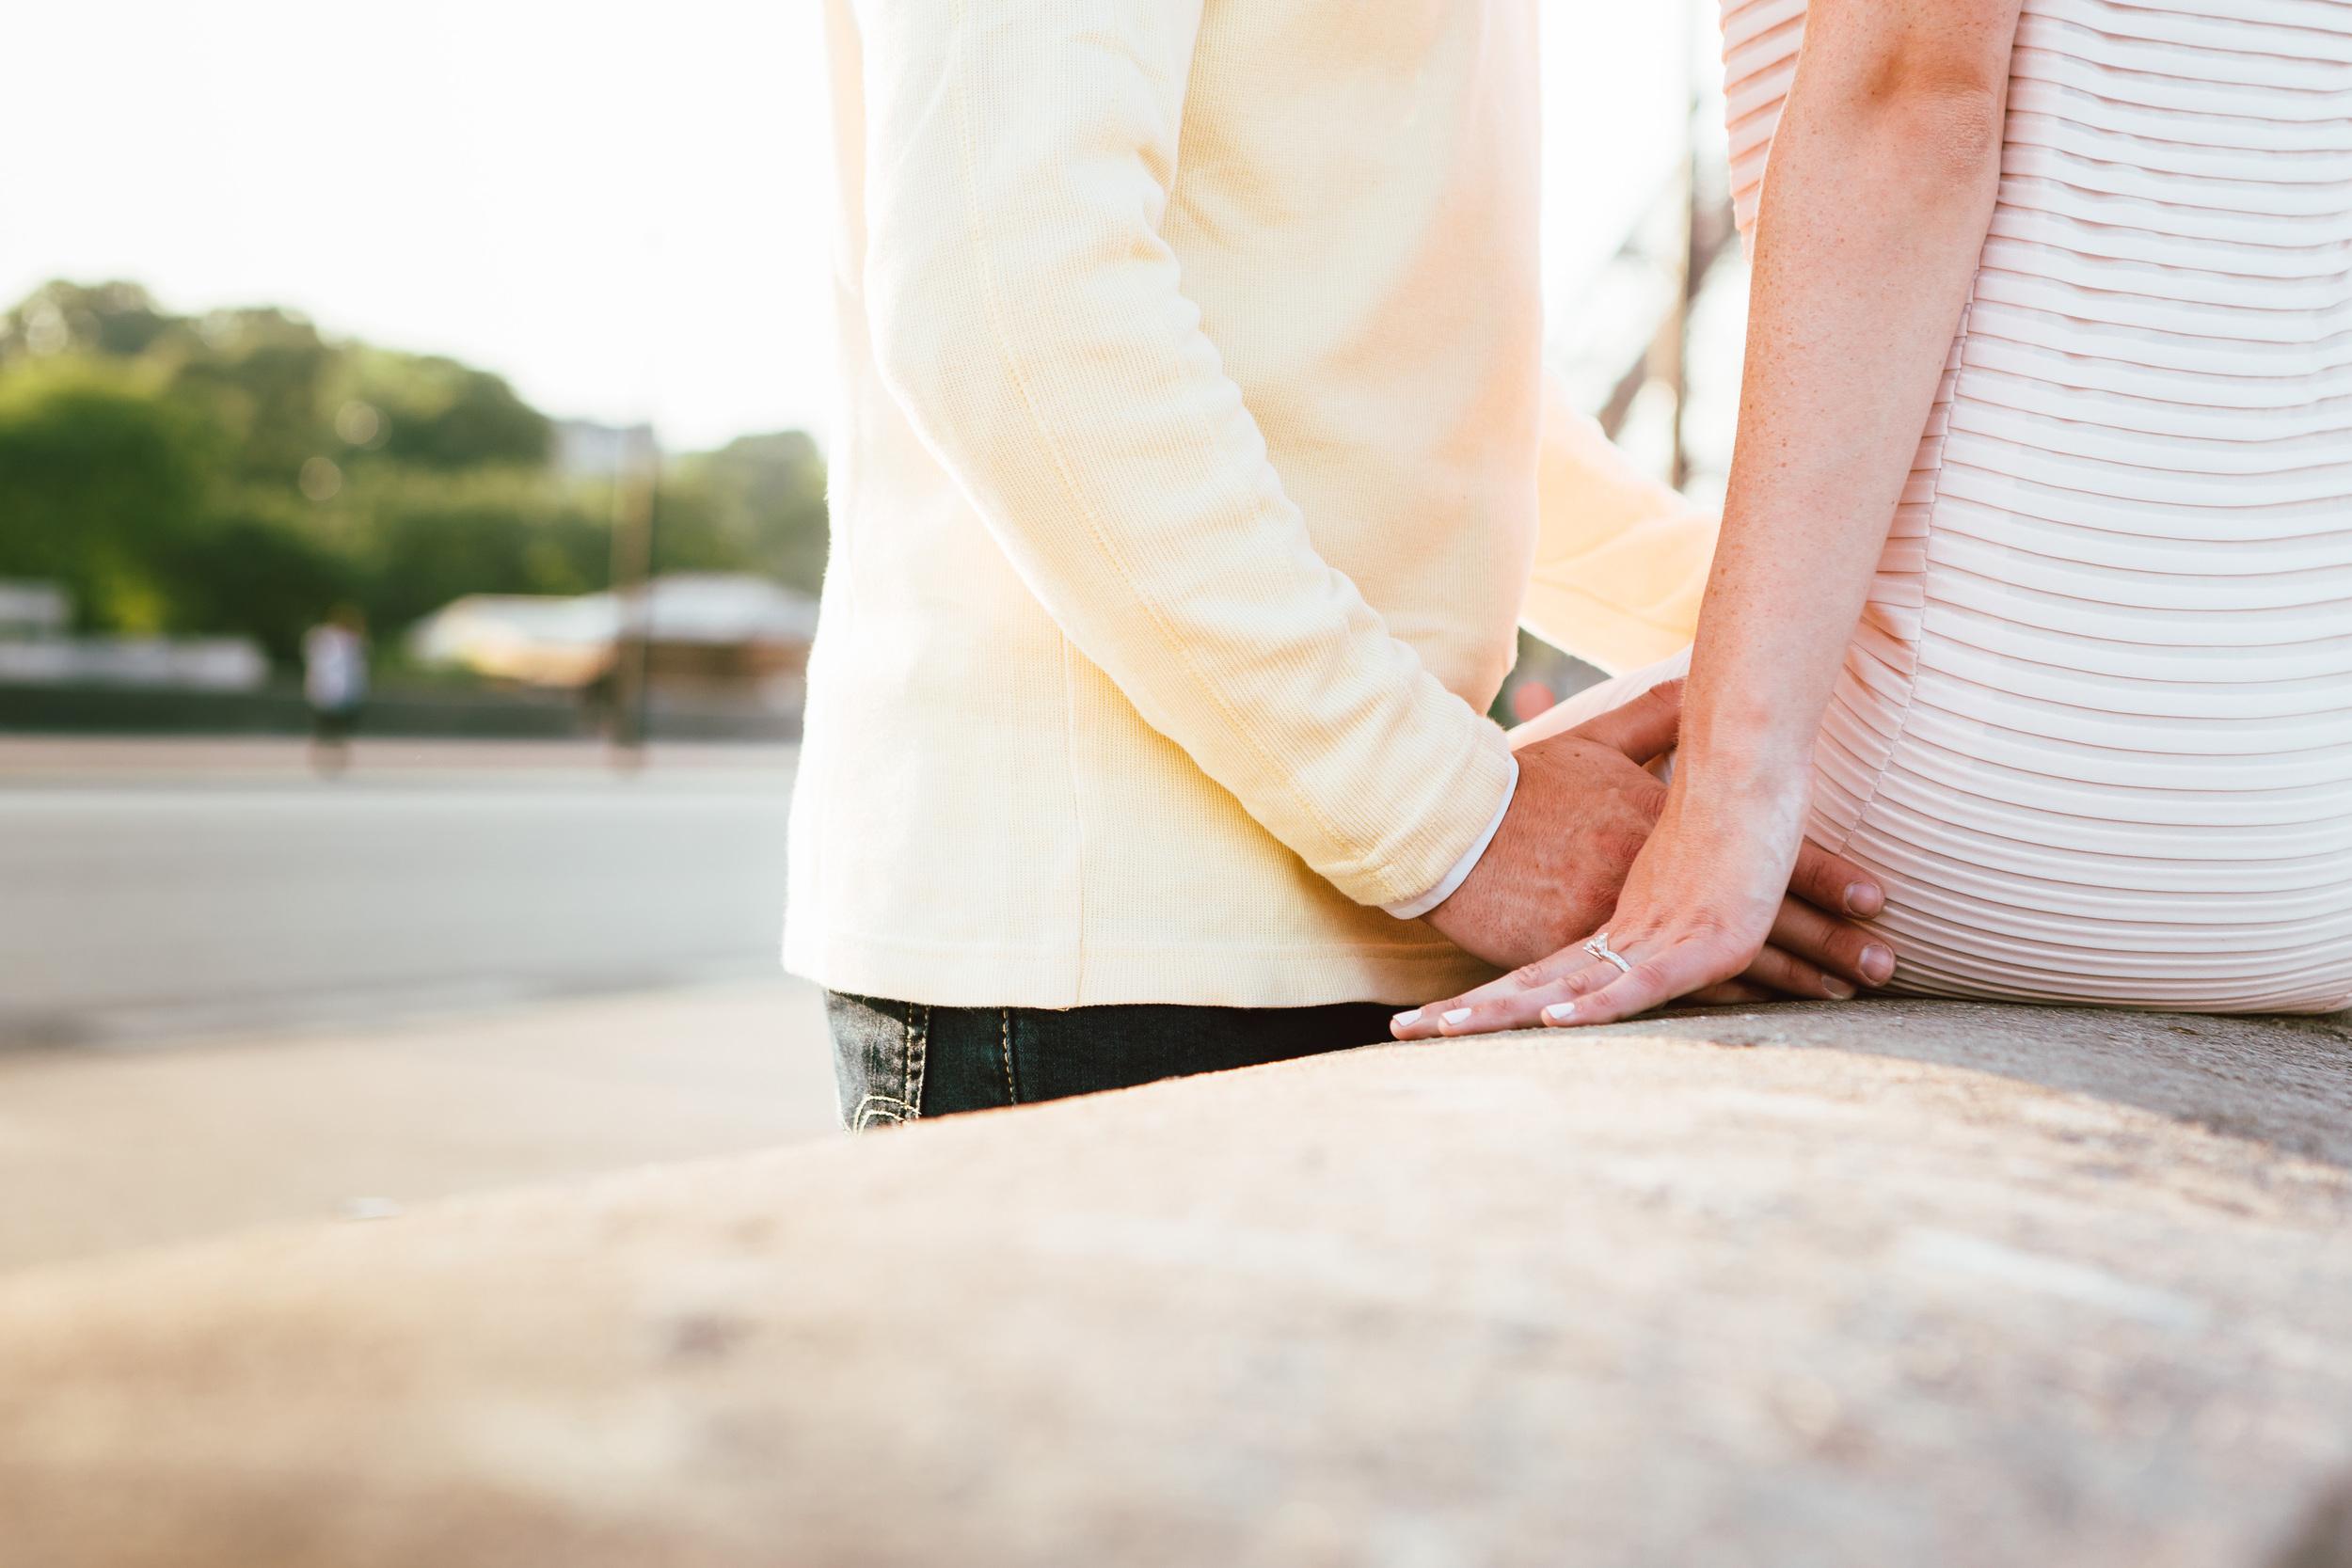 Photographer in Paris, Surprise Proposal, Ring, Engagement, Iheartparisfr